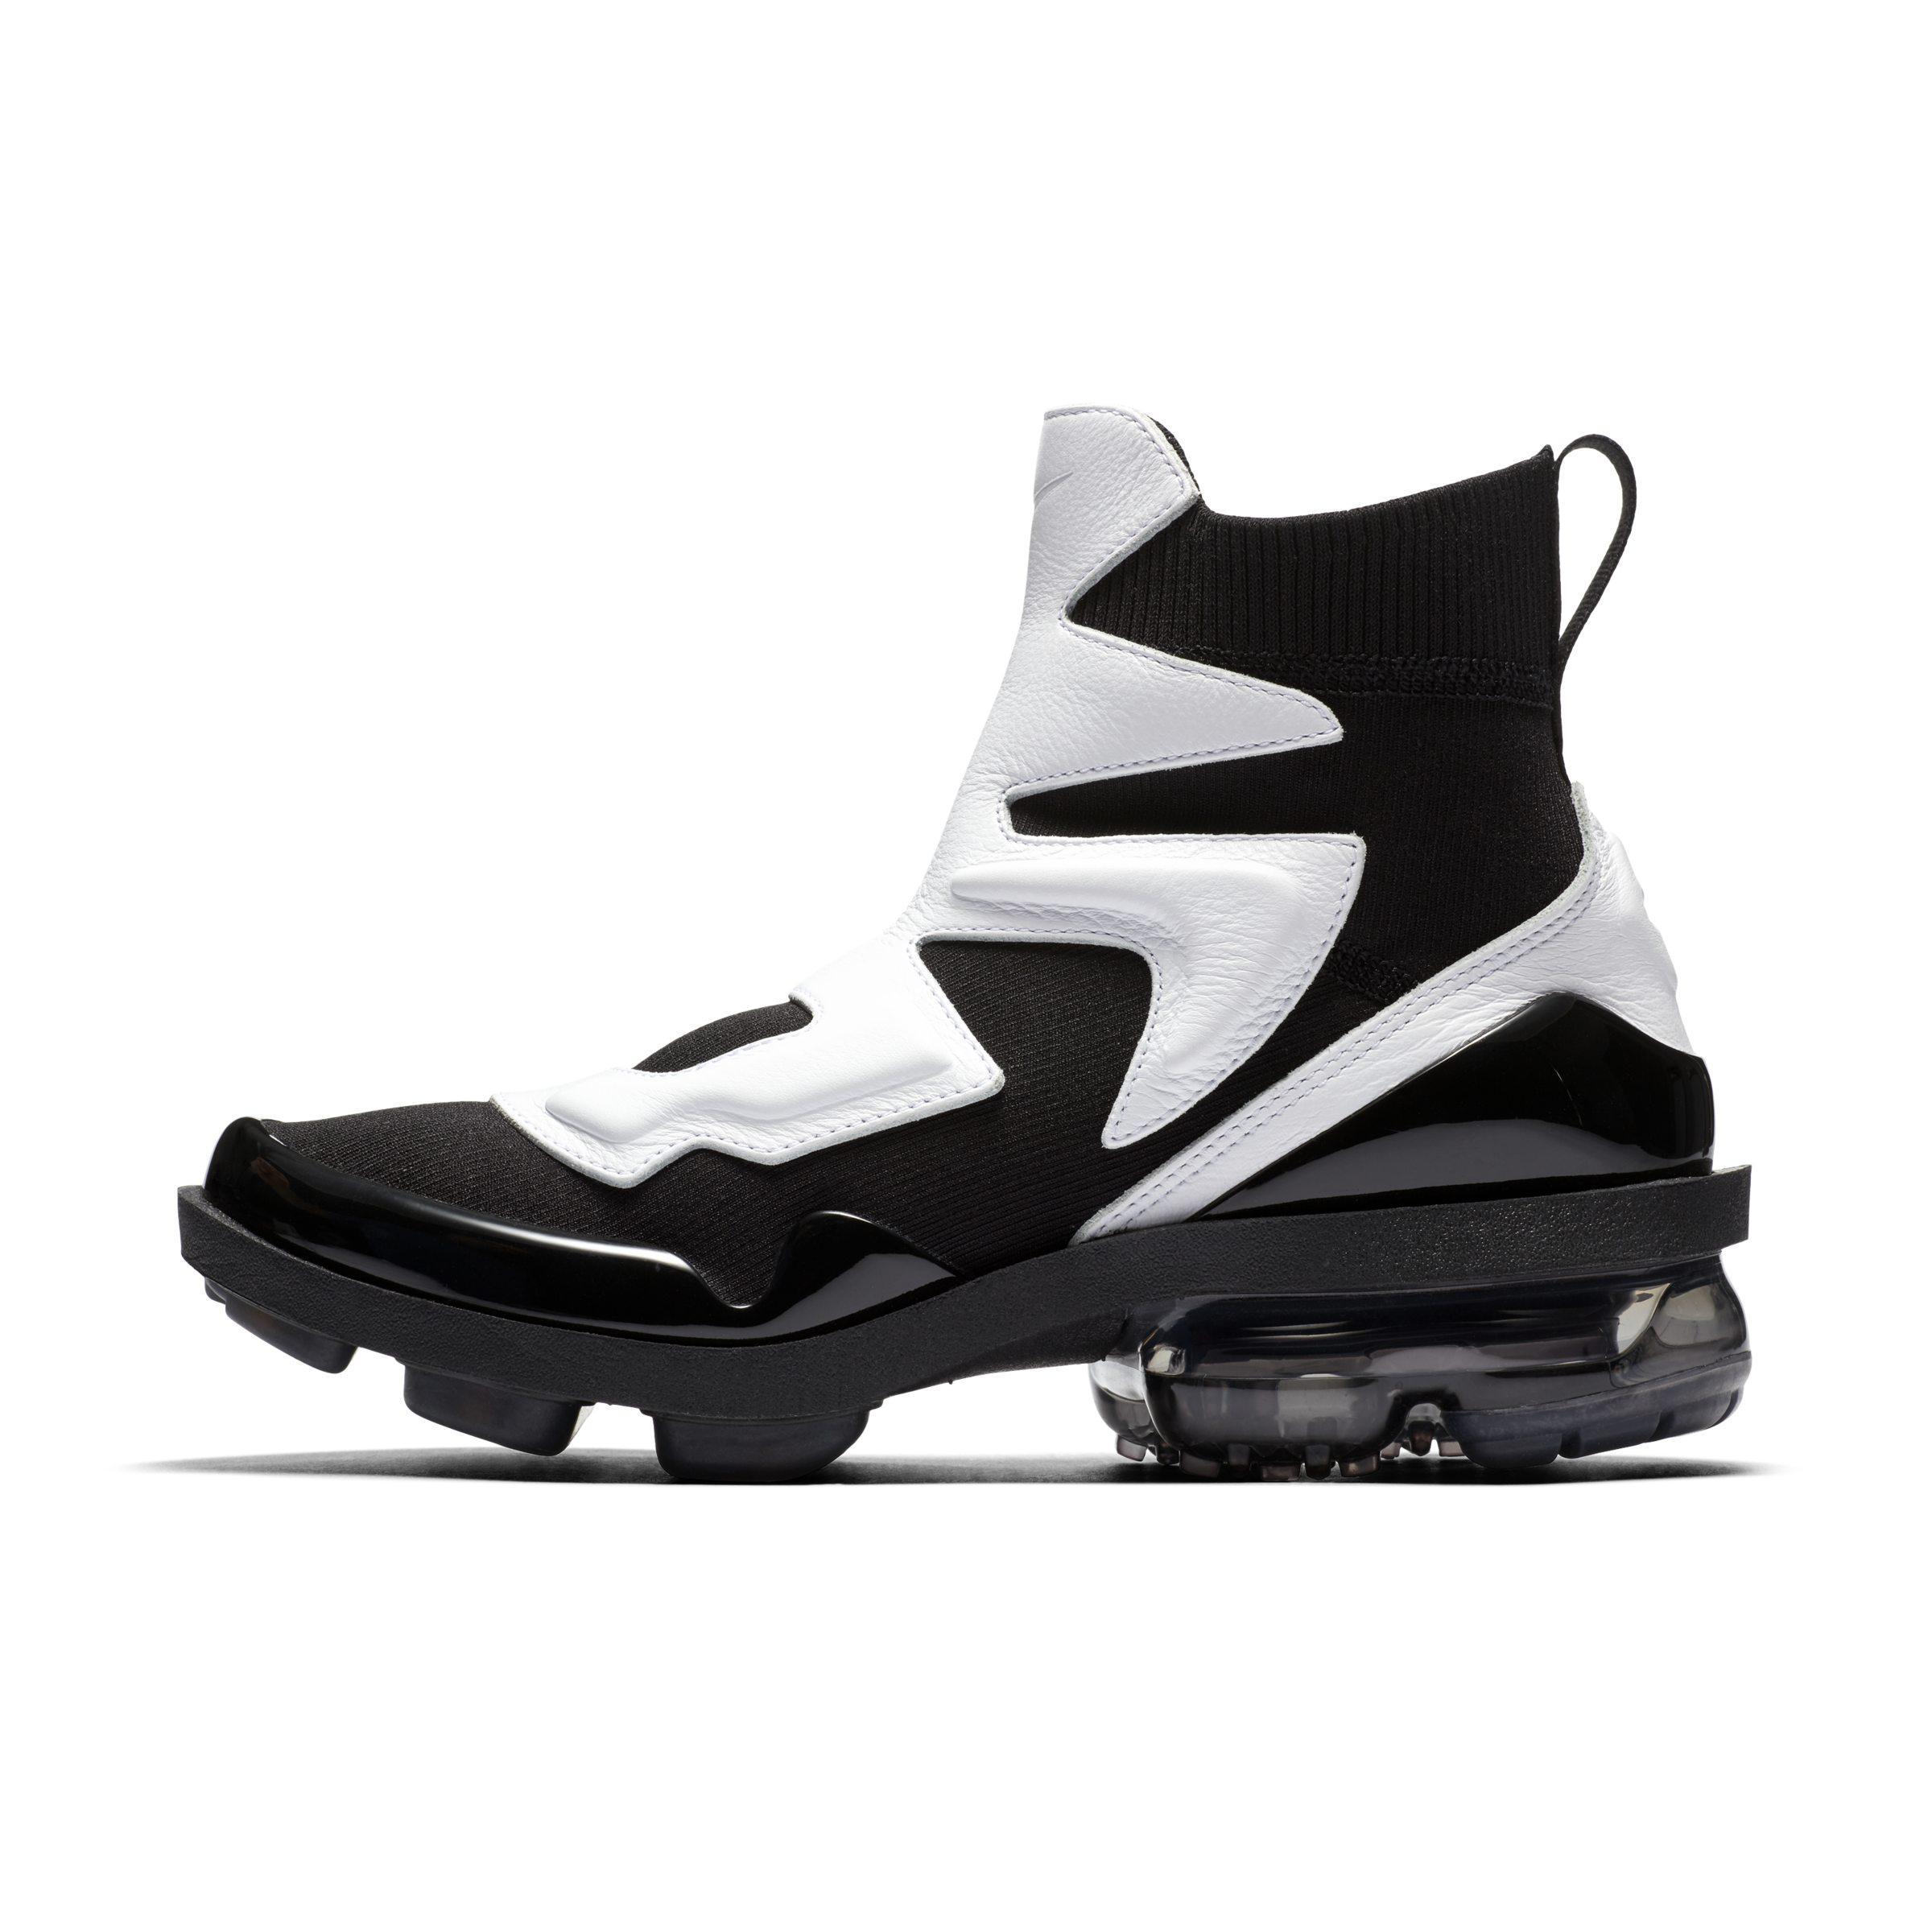 3f5263f7a5850 Nike Air Vapormax Light Ii Shoe in Black - Lyst